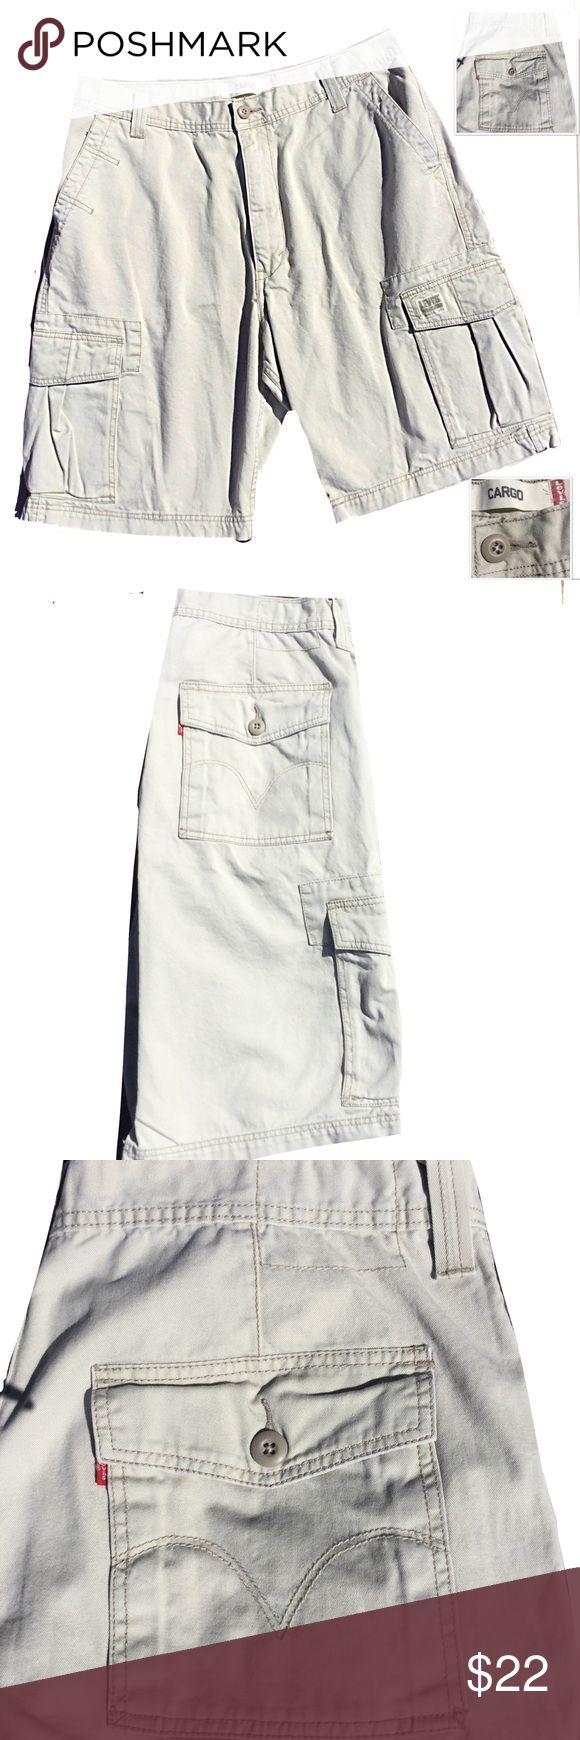 LEVI CARGO SHORTS. NWOT MENS W 38 INSEAM 11 LEVI CARGO SHORTS. NWOT MENS W 38 INSEAM 11 100% Cotton.  All offers considered.  Bundle for an additional 10% Off.  Happy Poshing!  😊❤️ Levi's Shorts Cargo